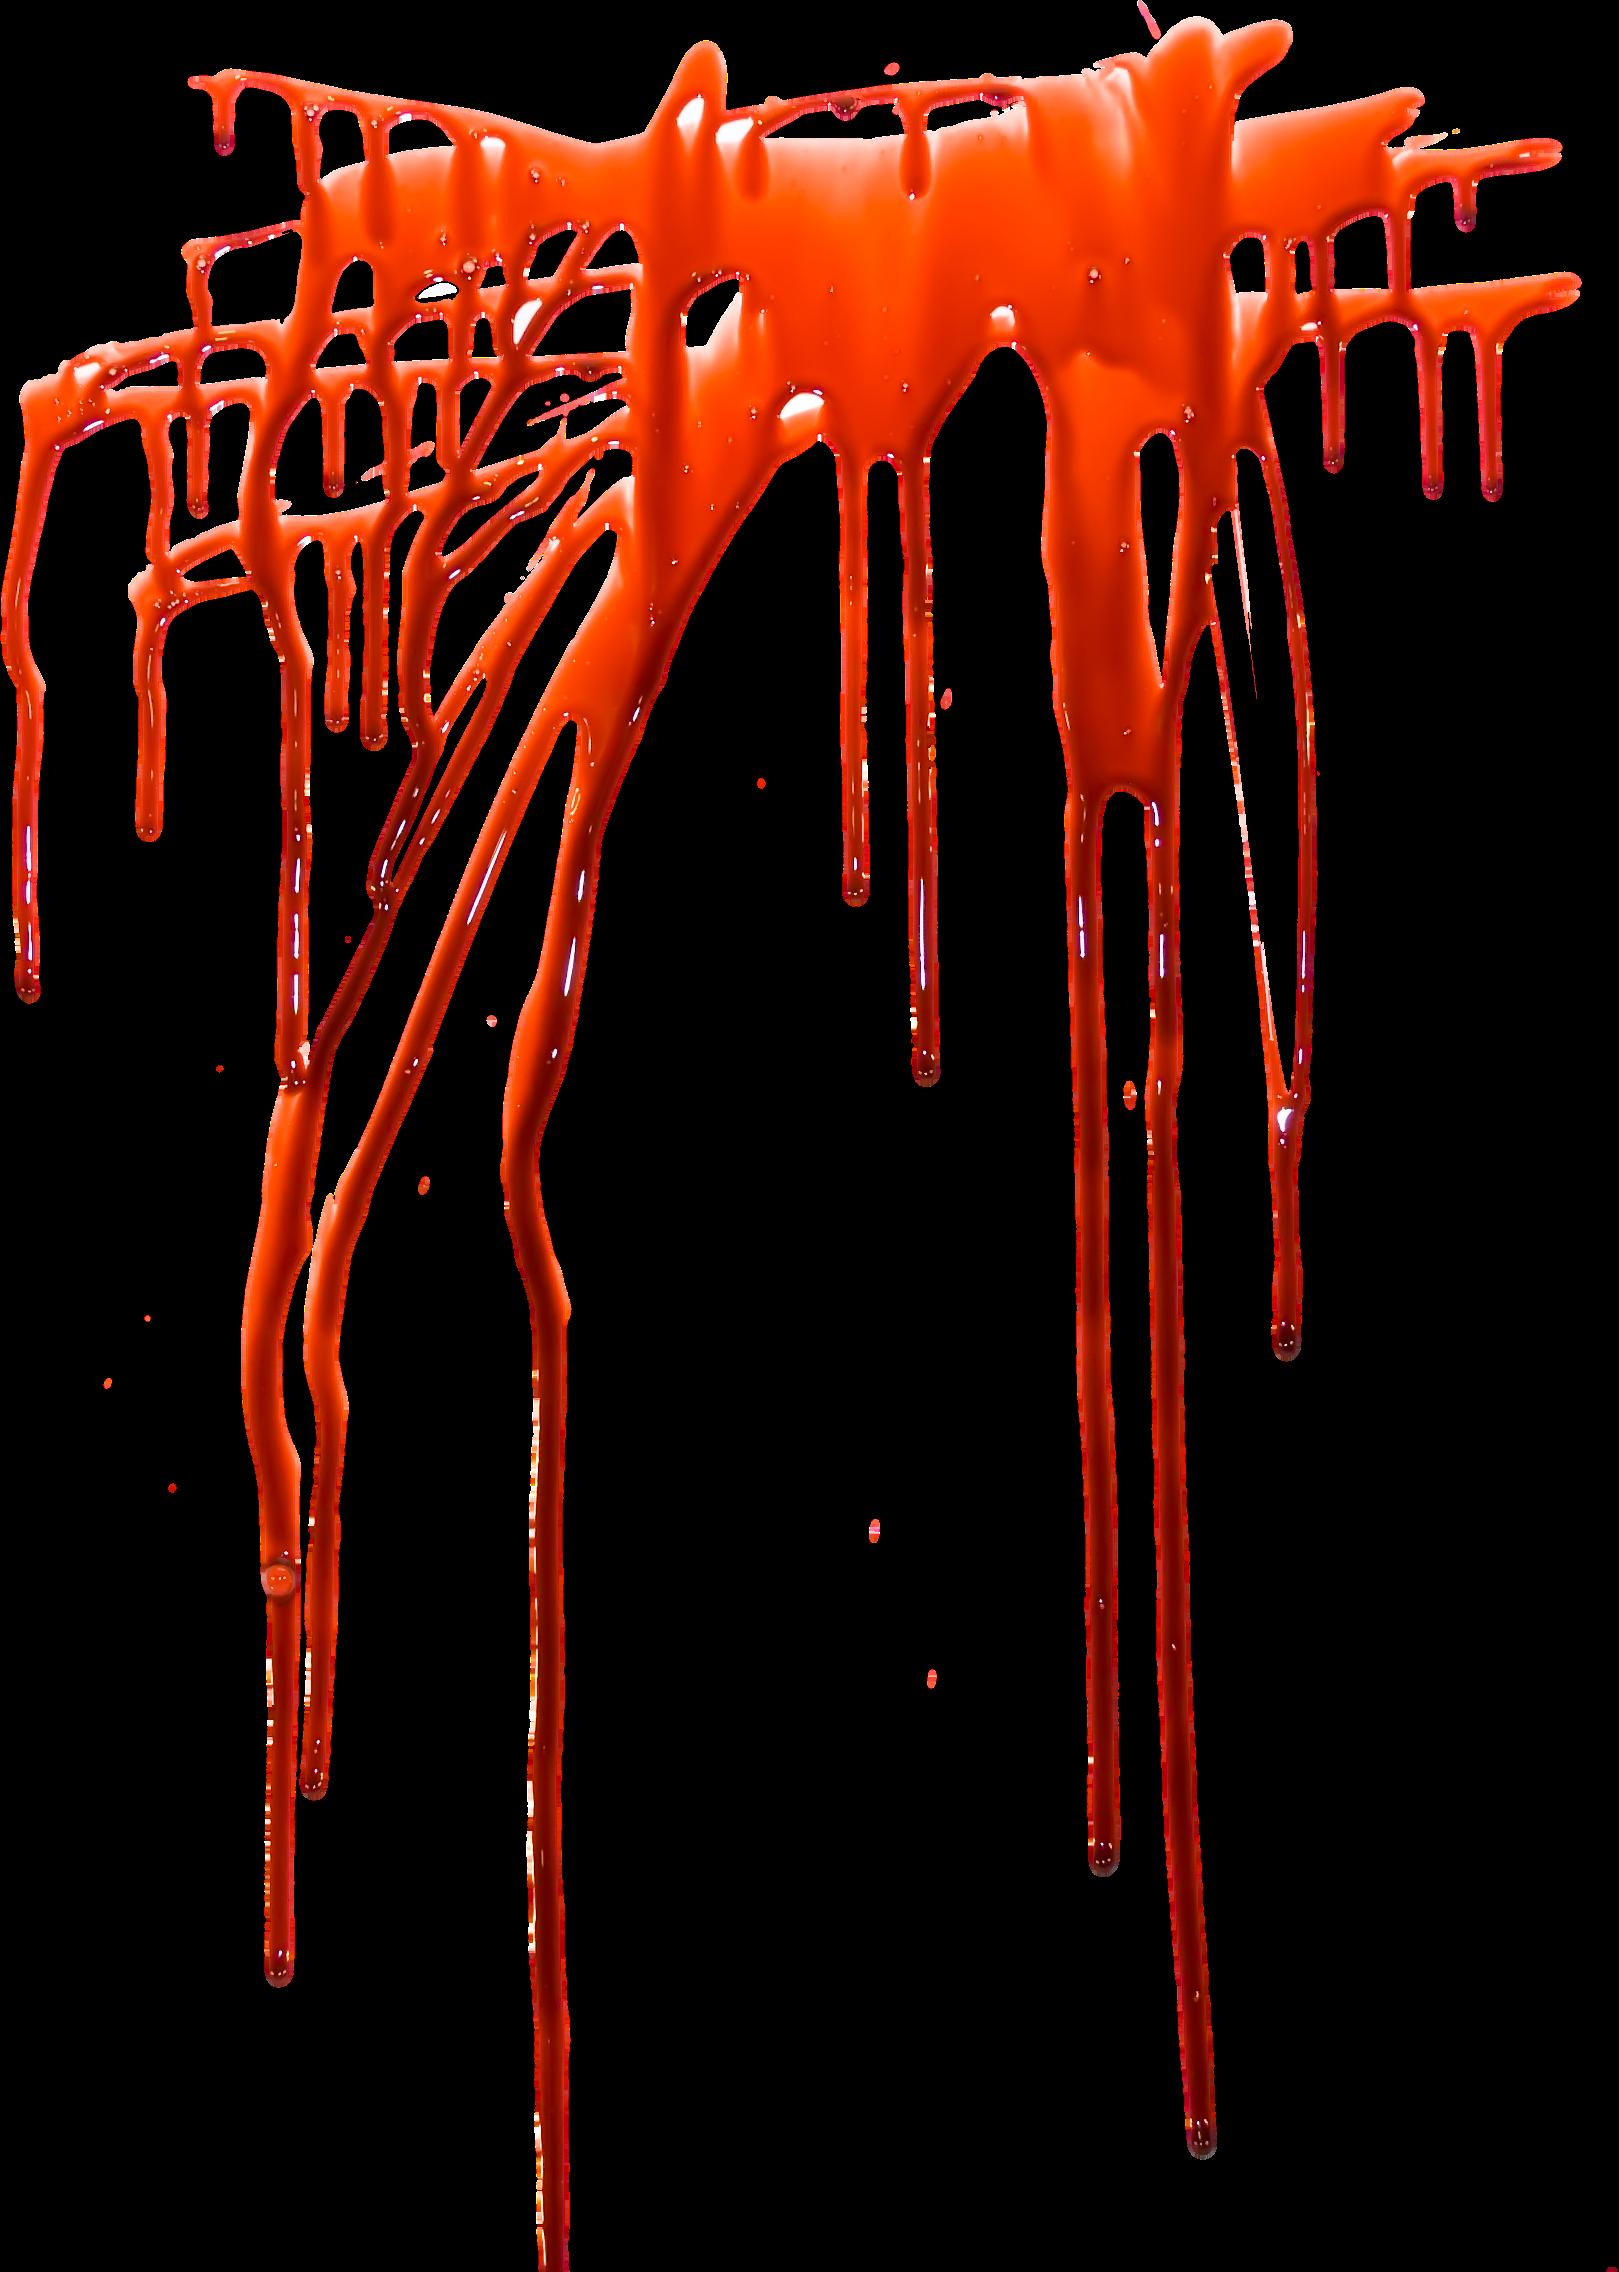 1619x2272 Blood Png Images Free Download, Blood Png Splashes